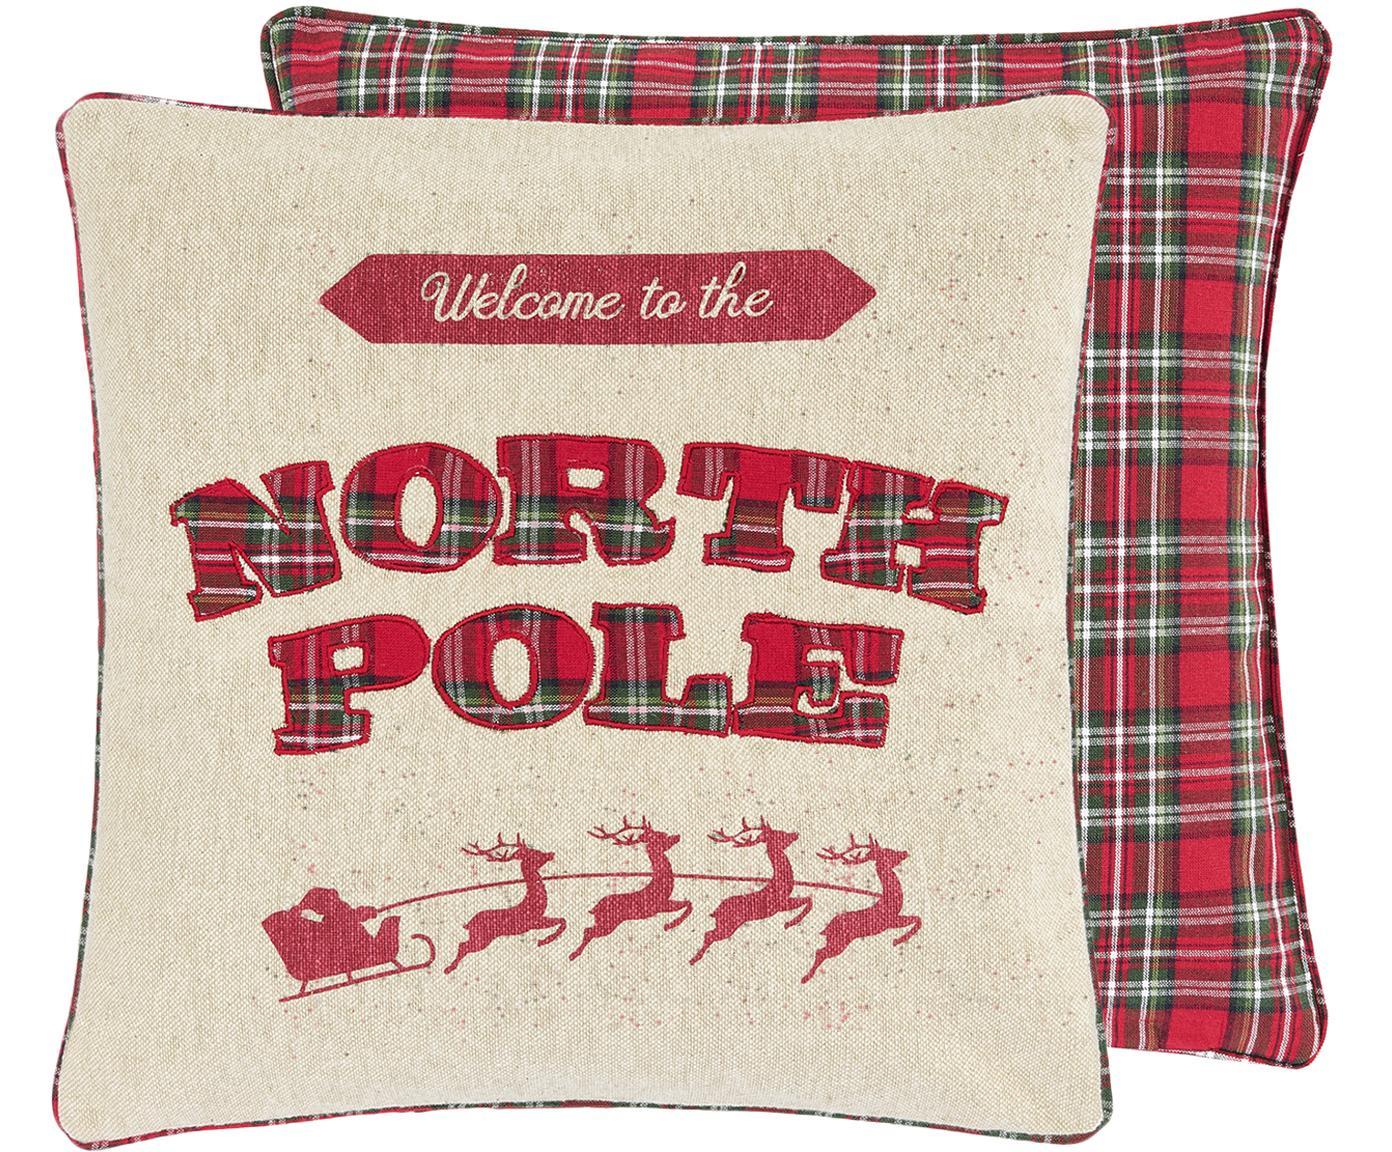 Funda de cojín North Pole, 100%algodón, Parte superior: beige, rojo, verde oscuro Parte trasera: rojo, verde oscuro a cu, An 45 x L 45 cm